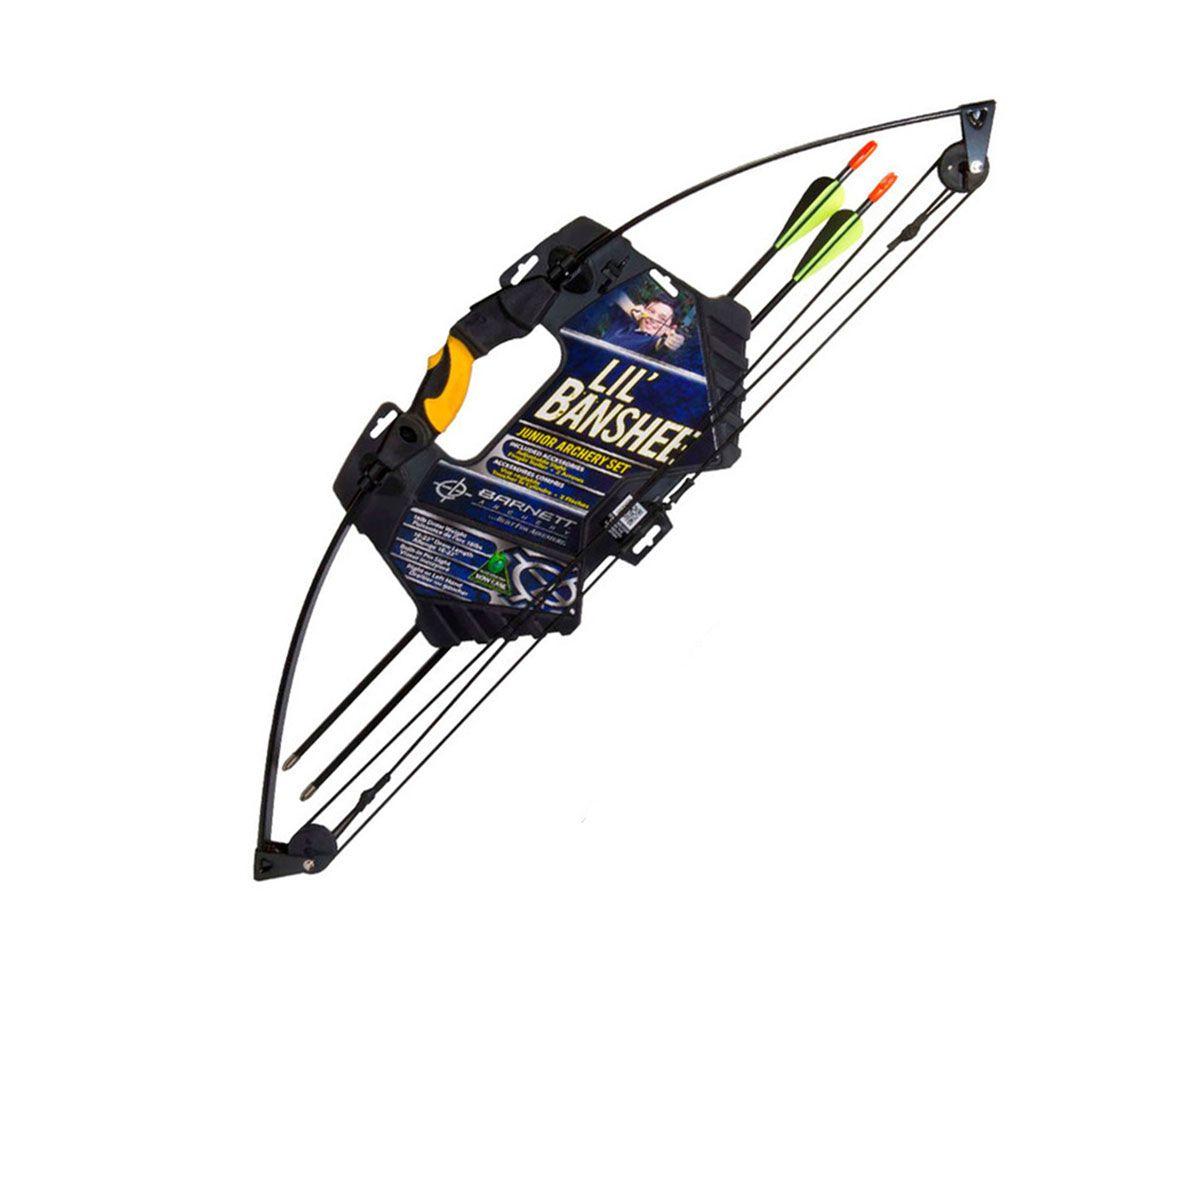 Arco Barnett Commader Lil`Banshee 18Lb c/ 2 Flechas Inclusas - Ambidestro Preto